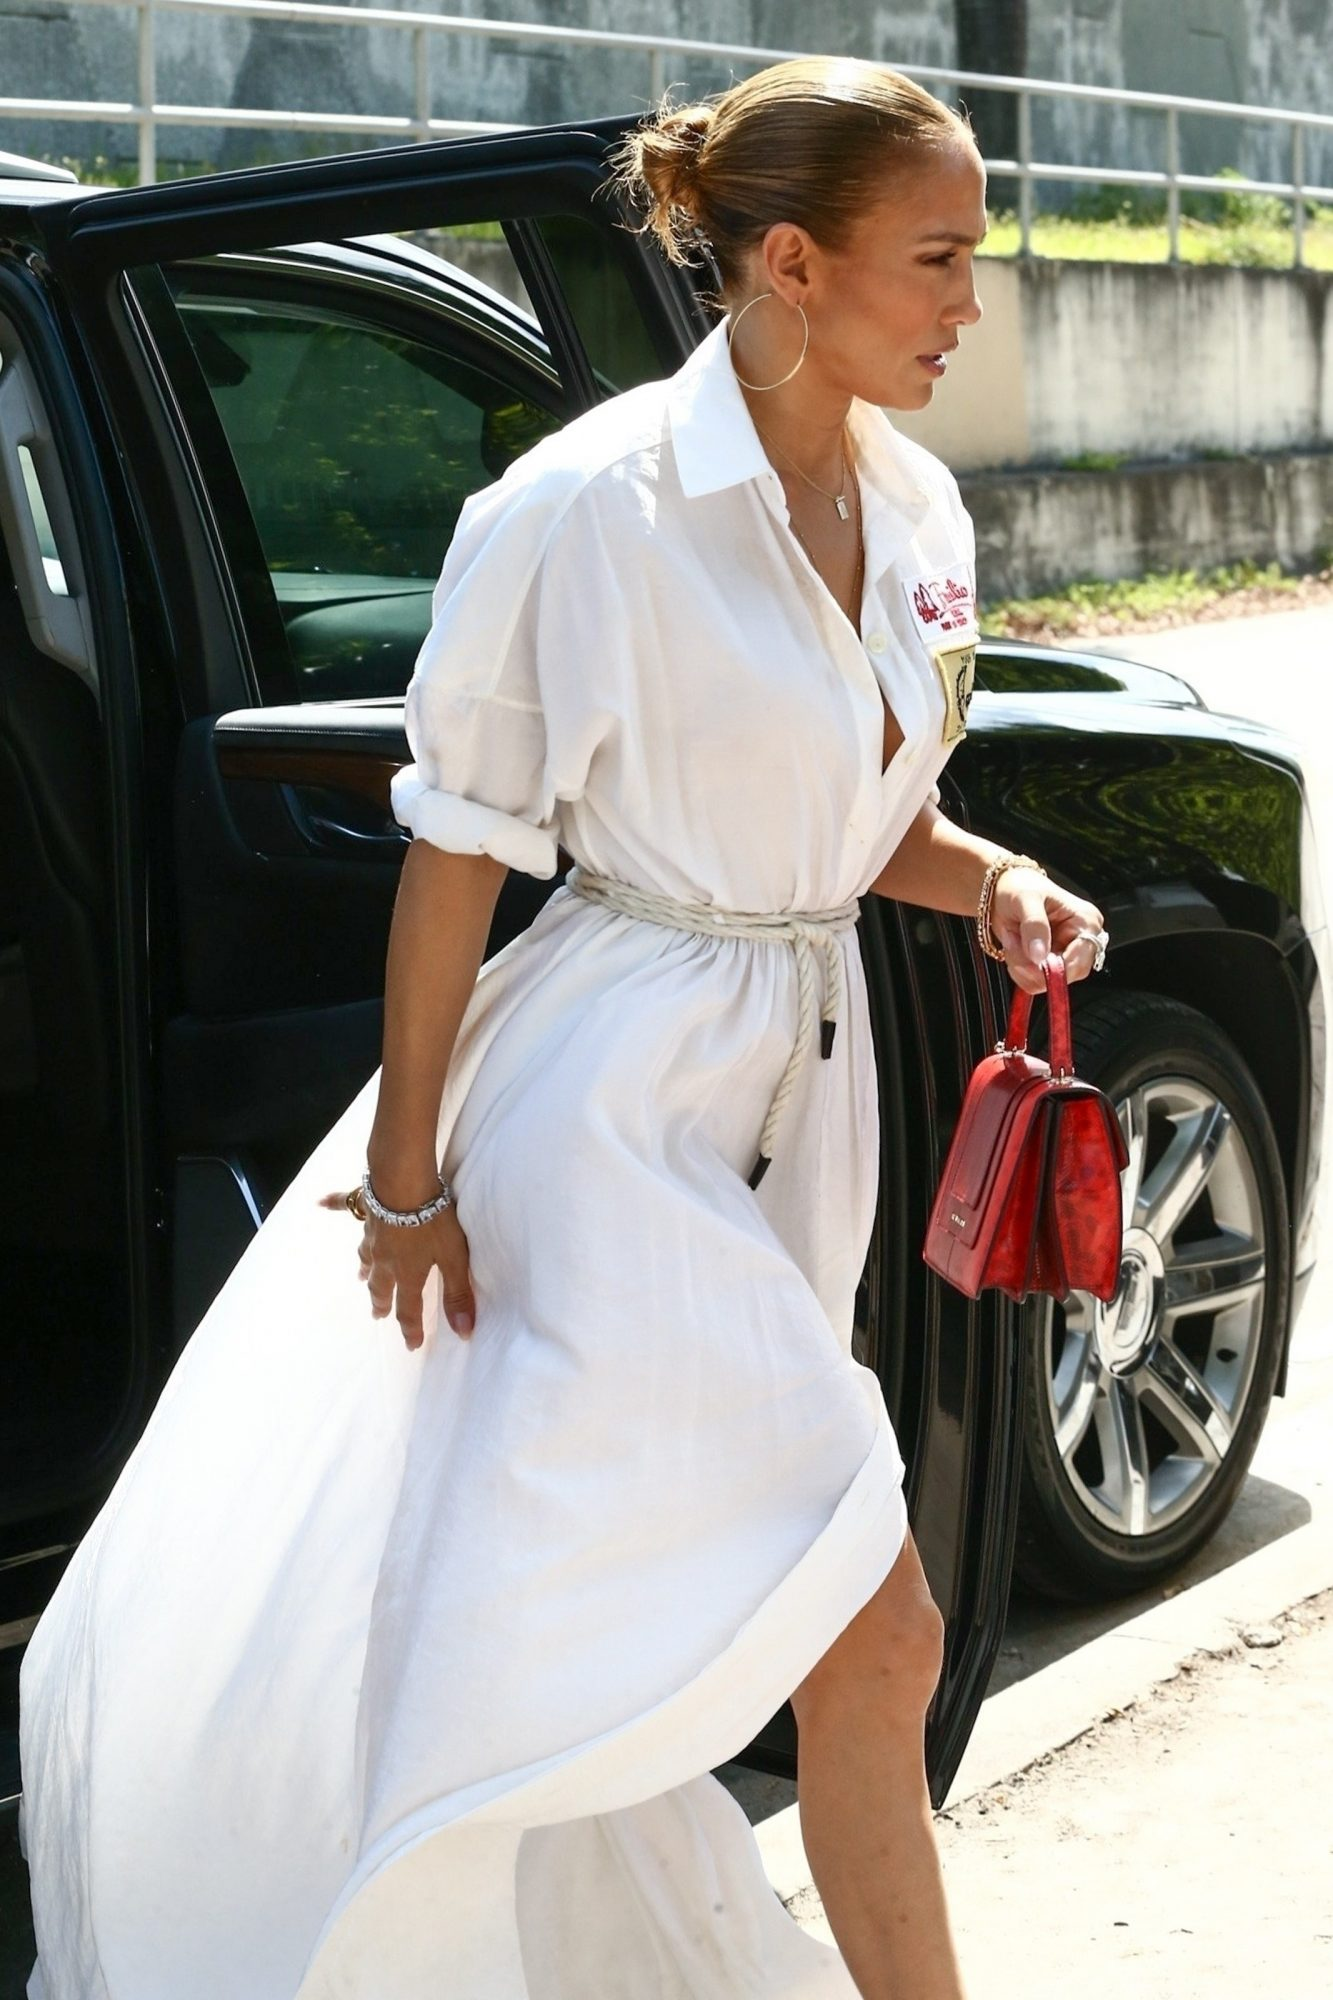 Jennifer Lopez, Jlo, miami, vestido blanco